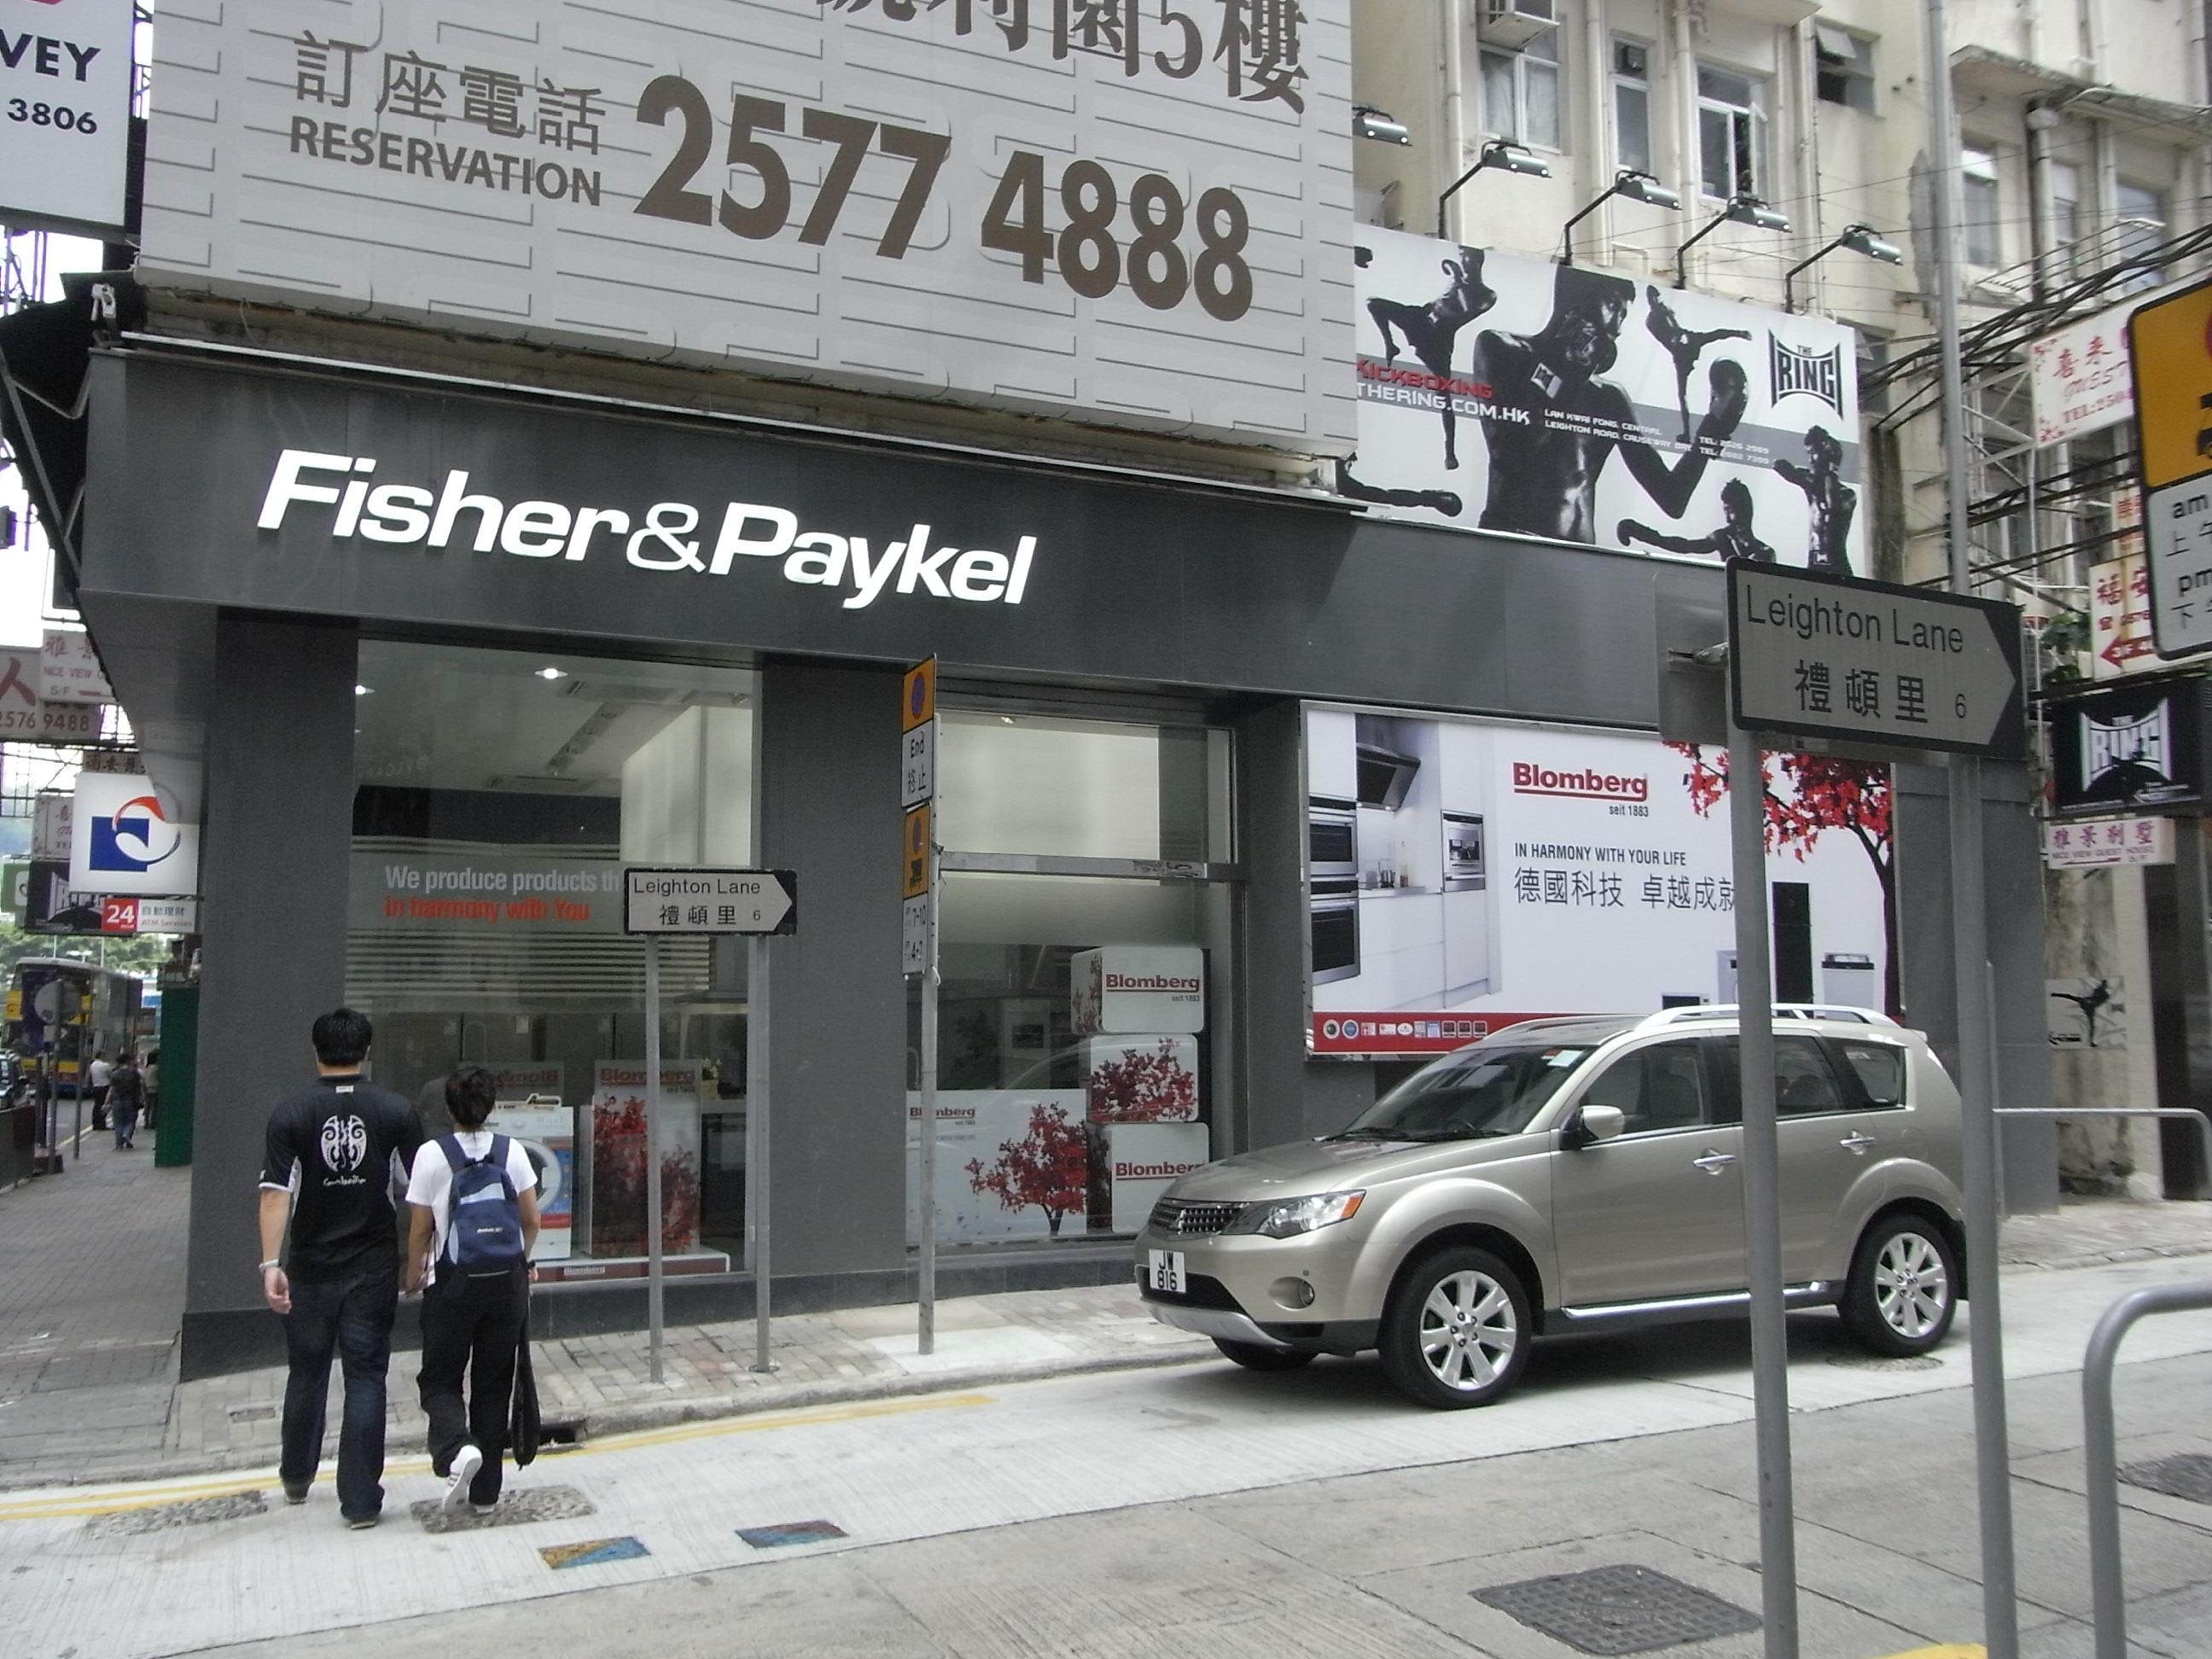 Fisher & Paykel - Wikipedia